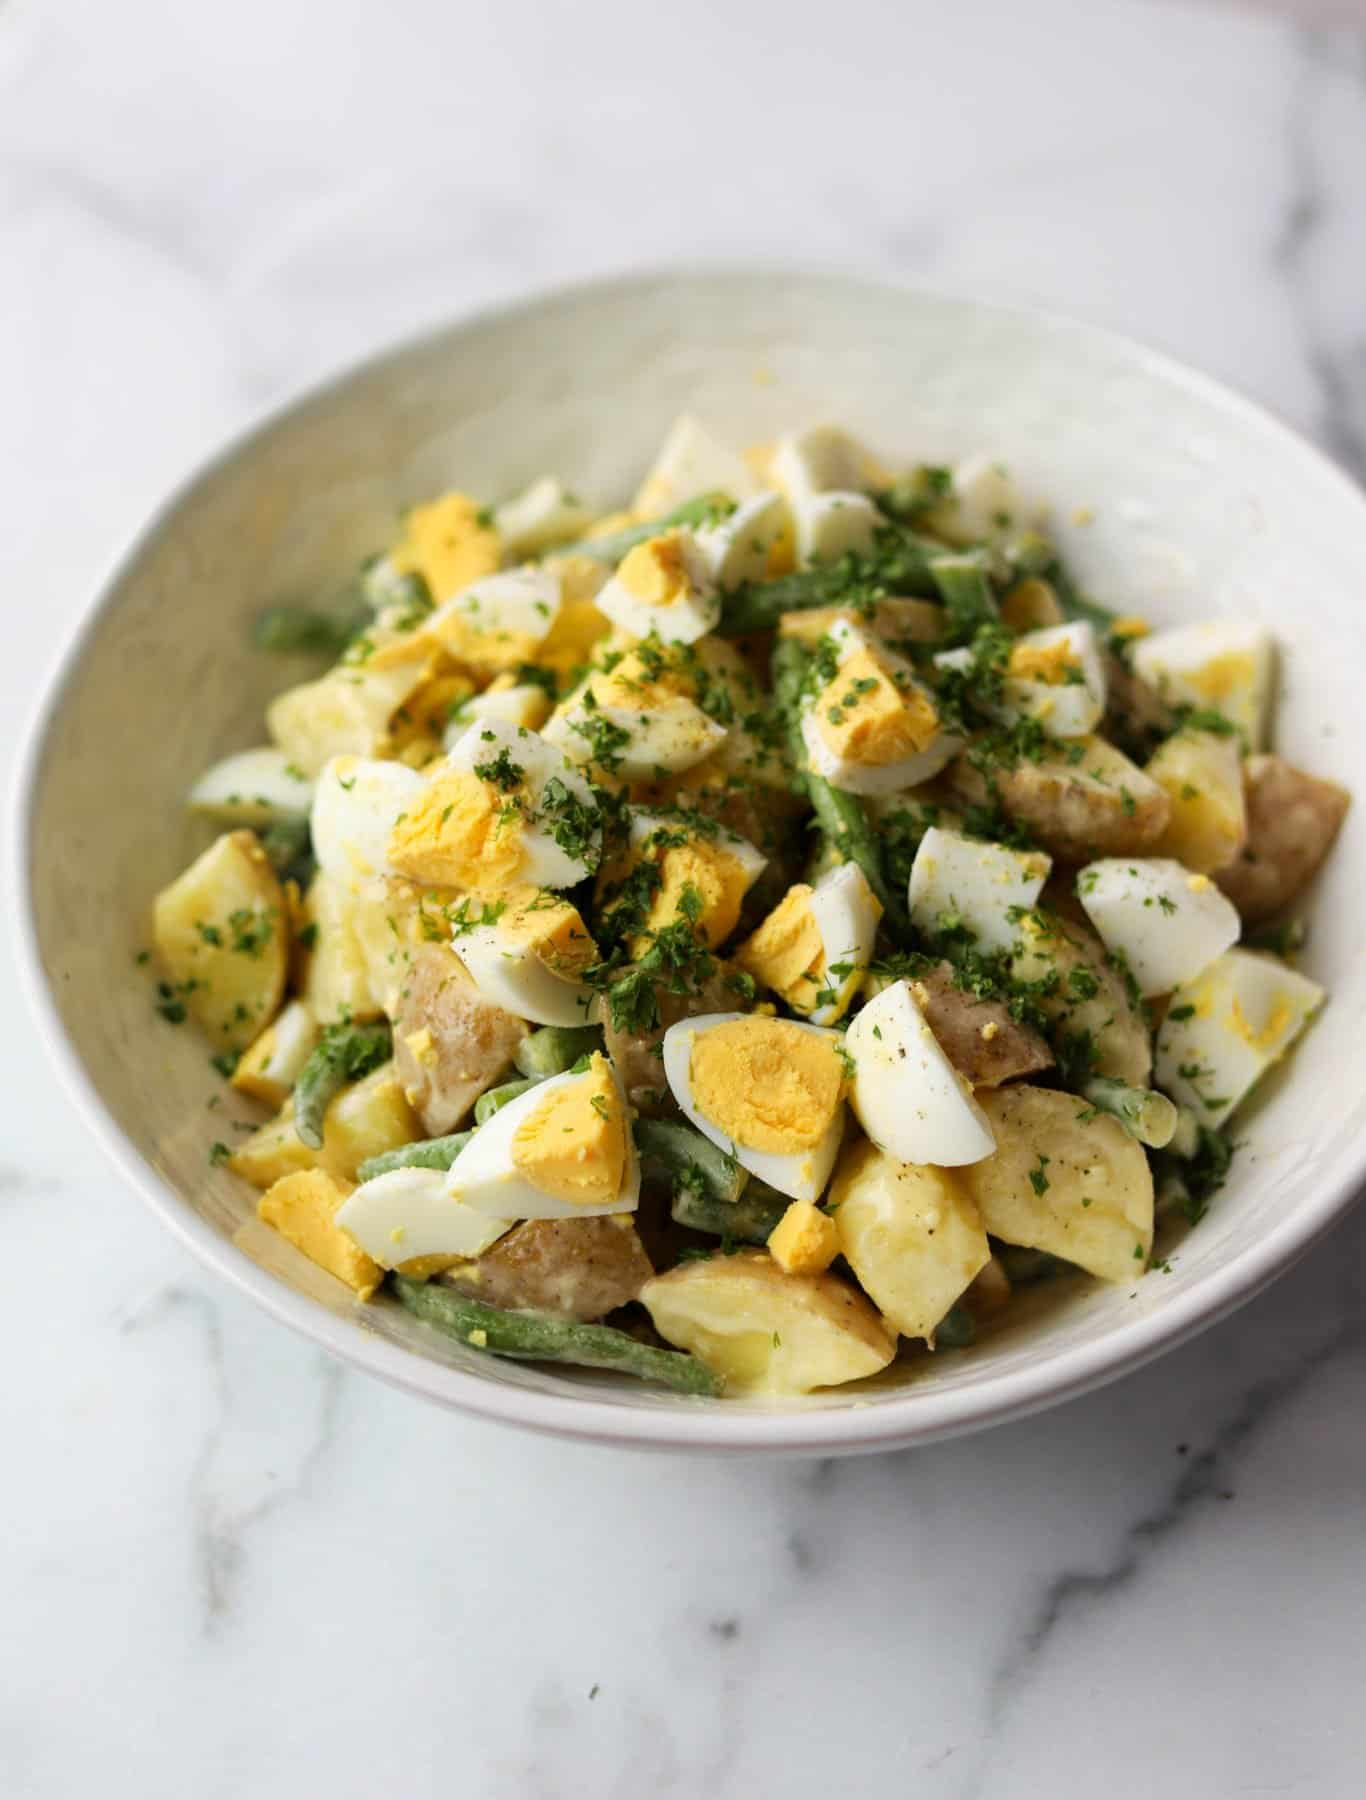 Healthy summer recipe for green bean potato salad in a white bowl